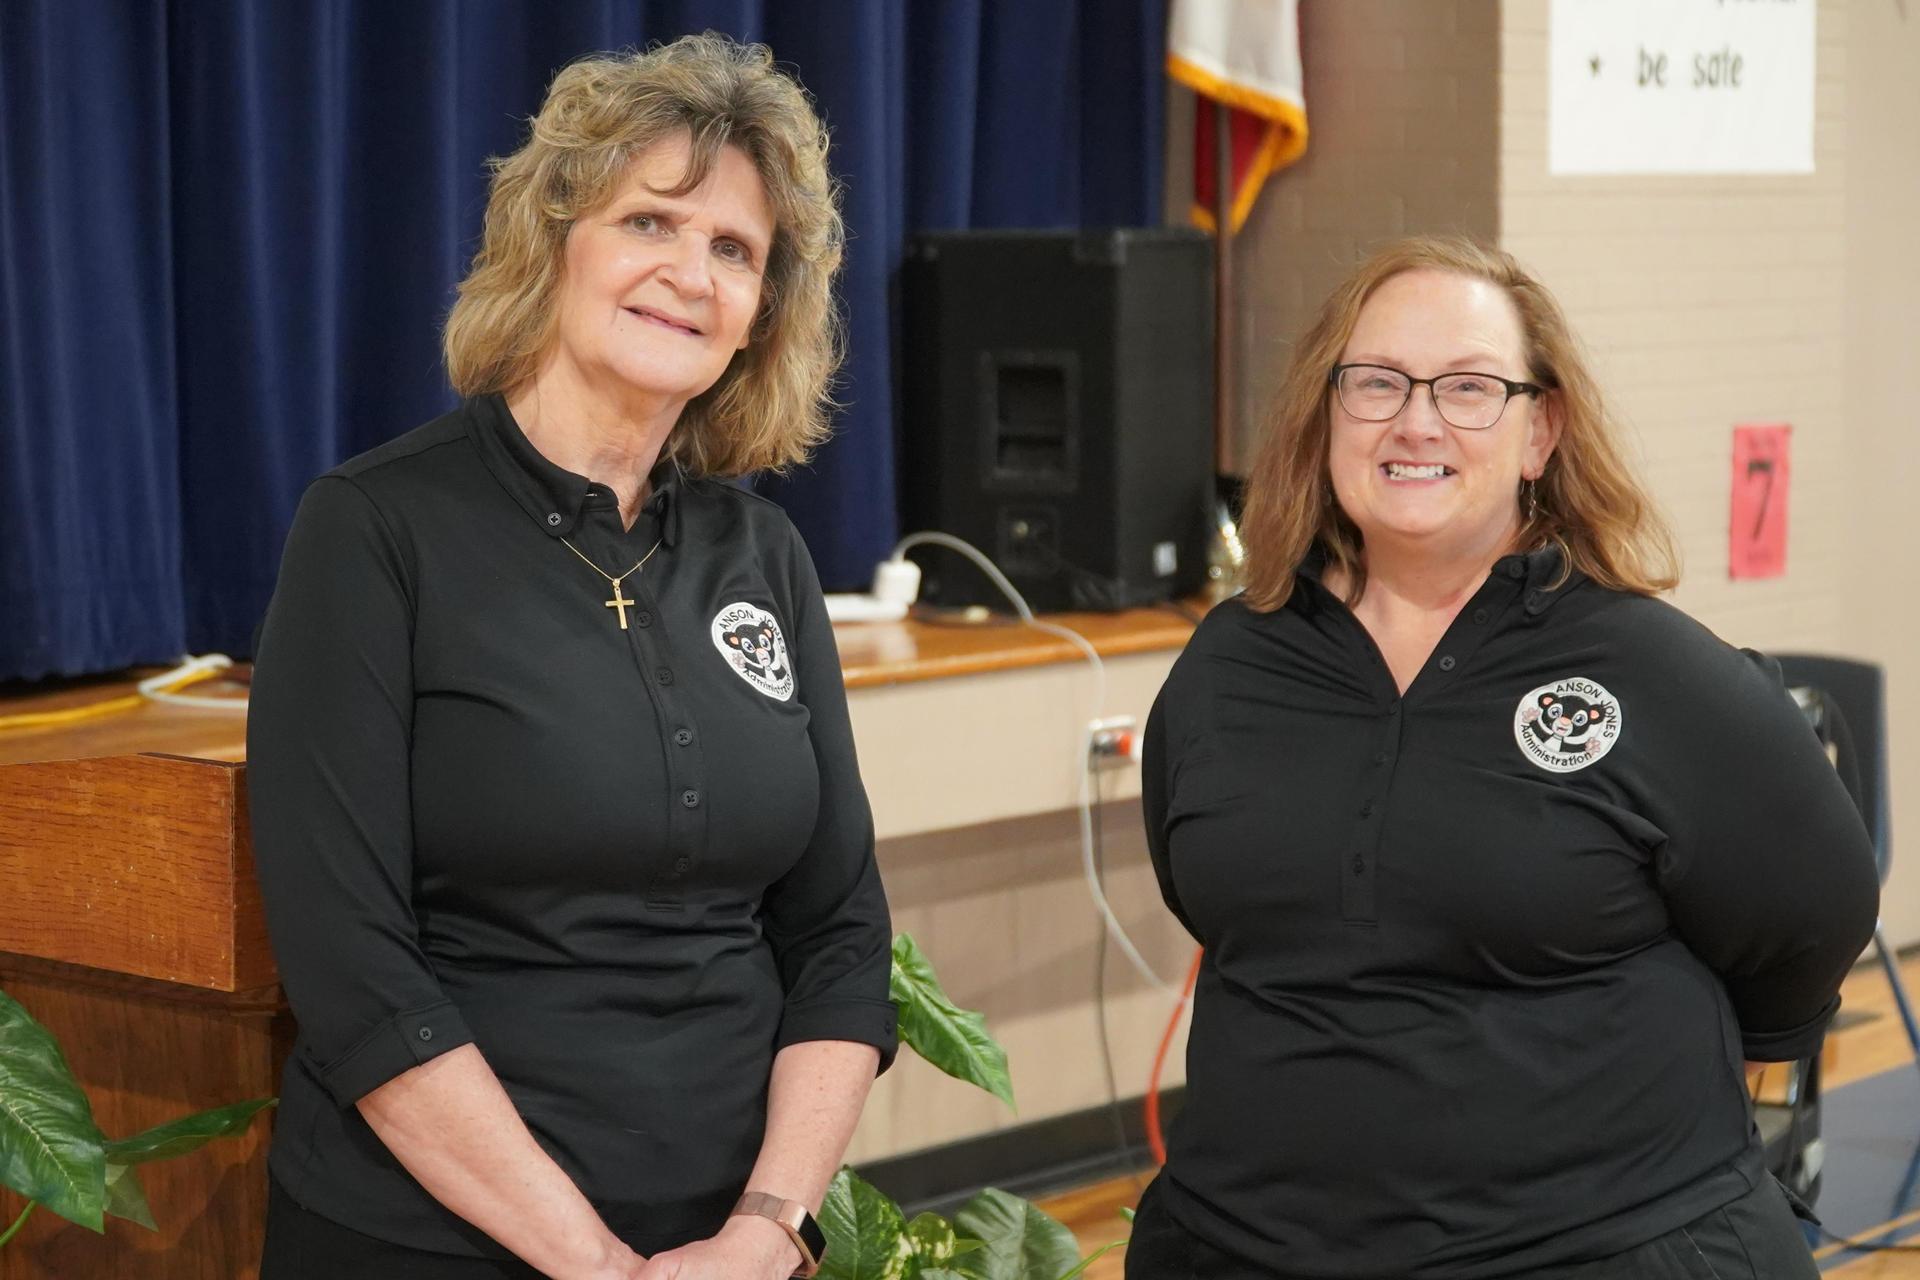 Linda Montoya and Courtney Piatt